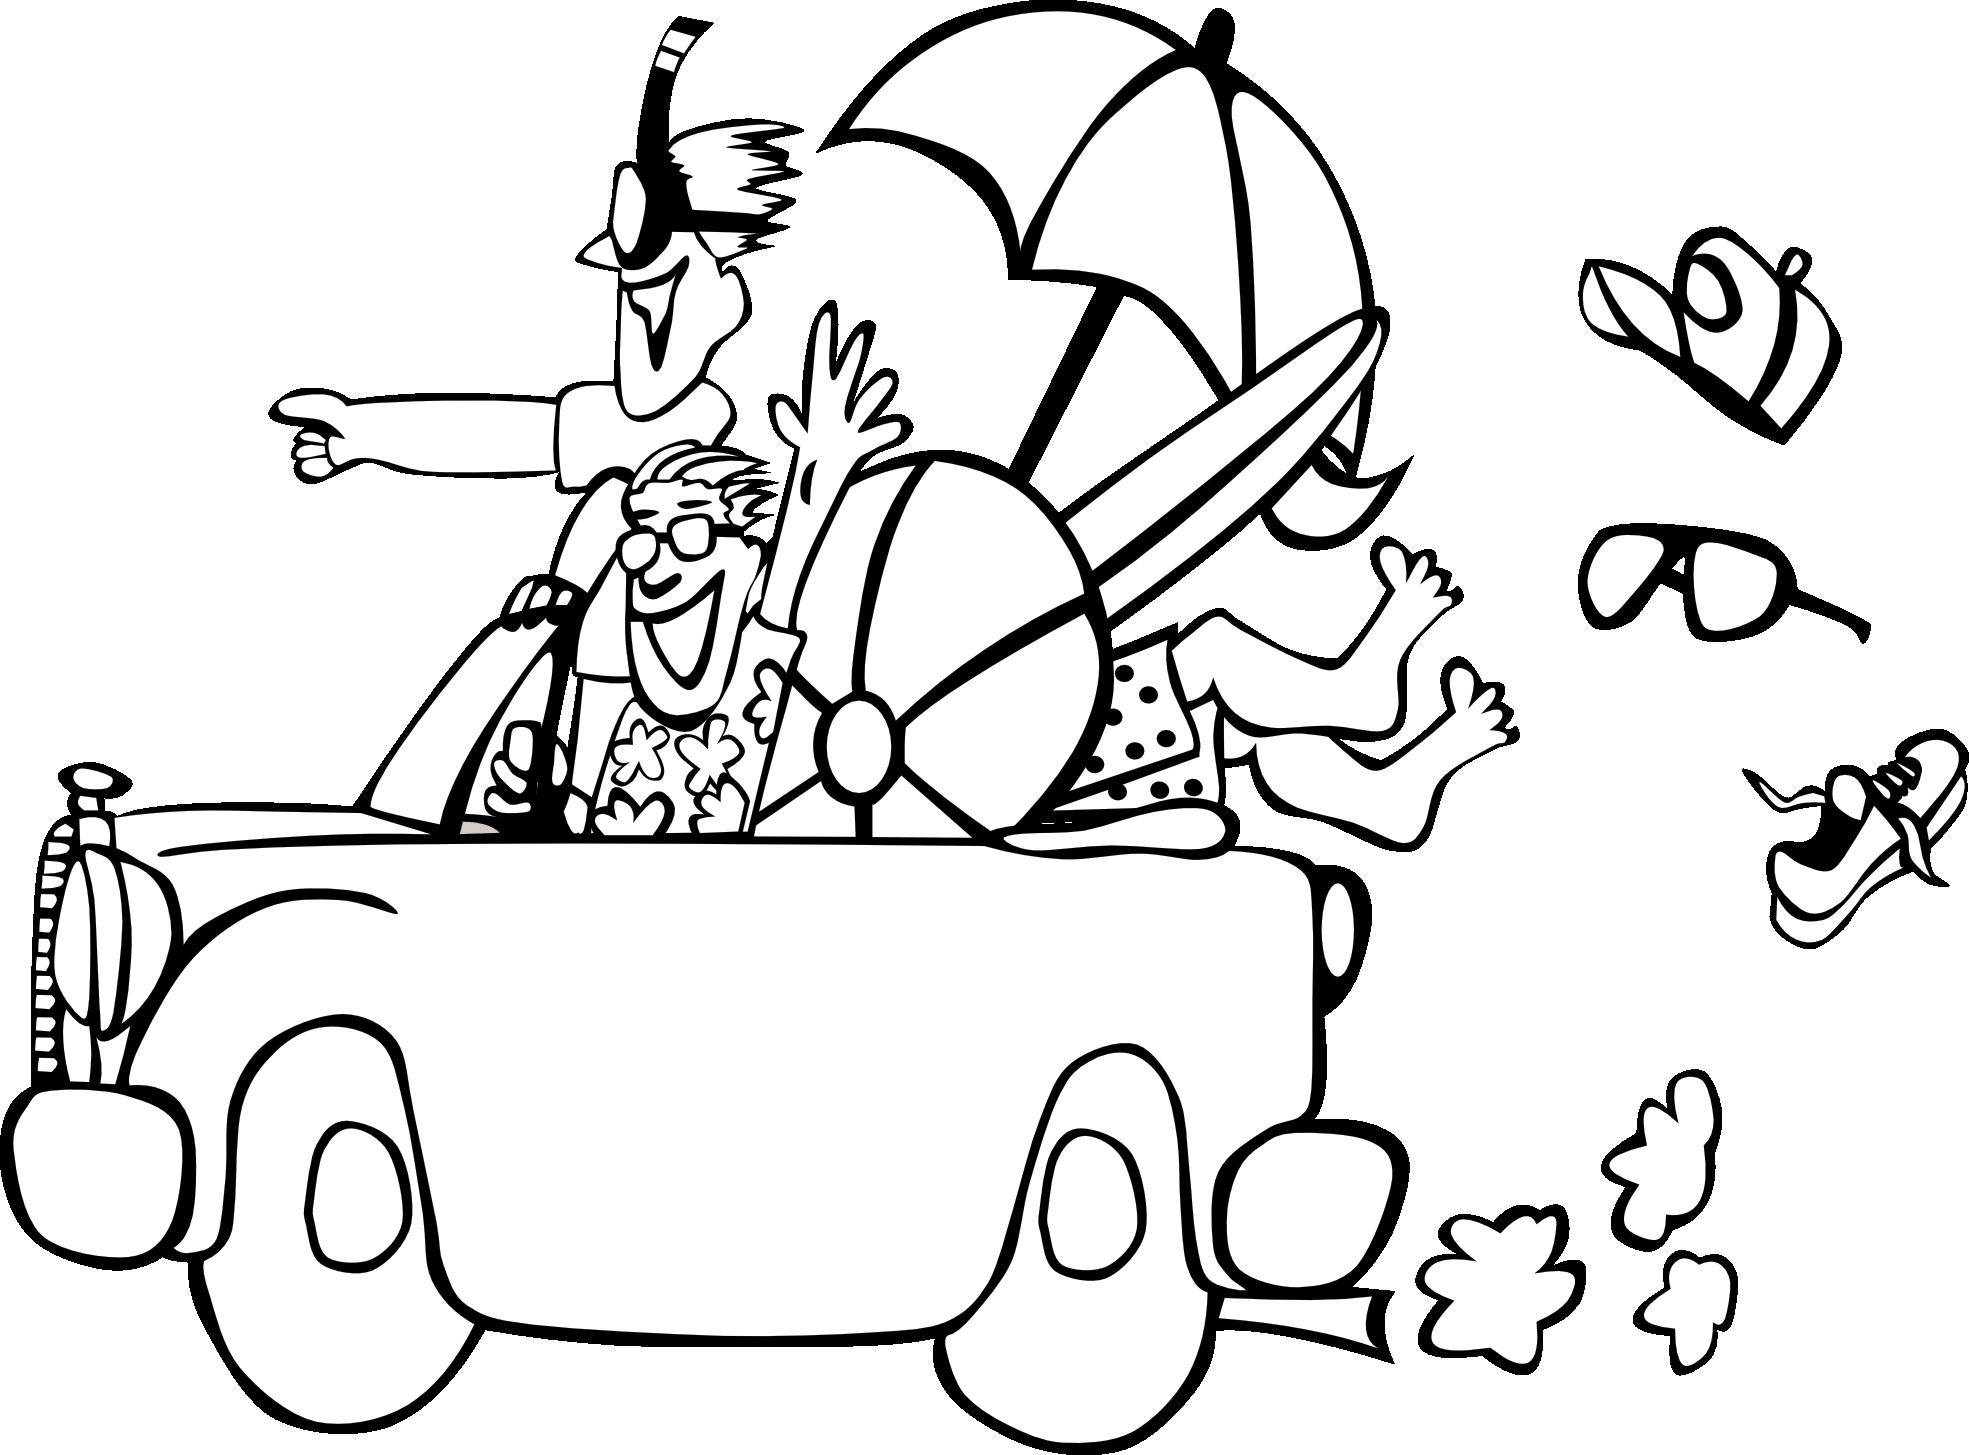 Free Black Cliparts Funny, Download Free Clip Art, Free Clip.